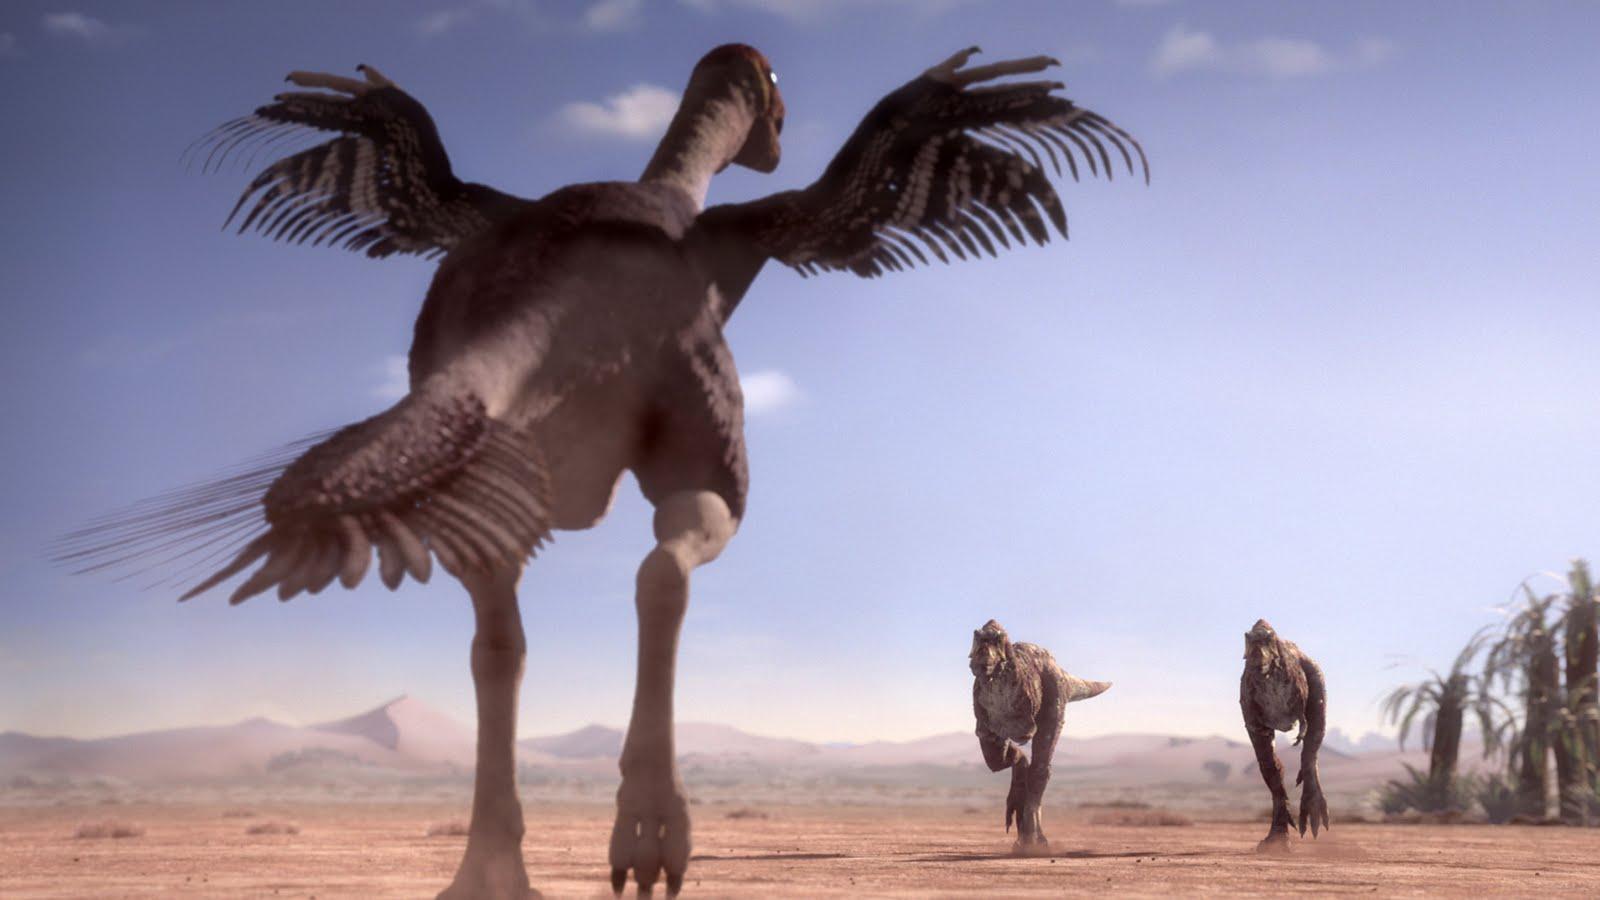 AGATHAUMAS: Gigantoraptor & Alectrosaurus